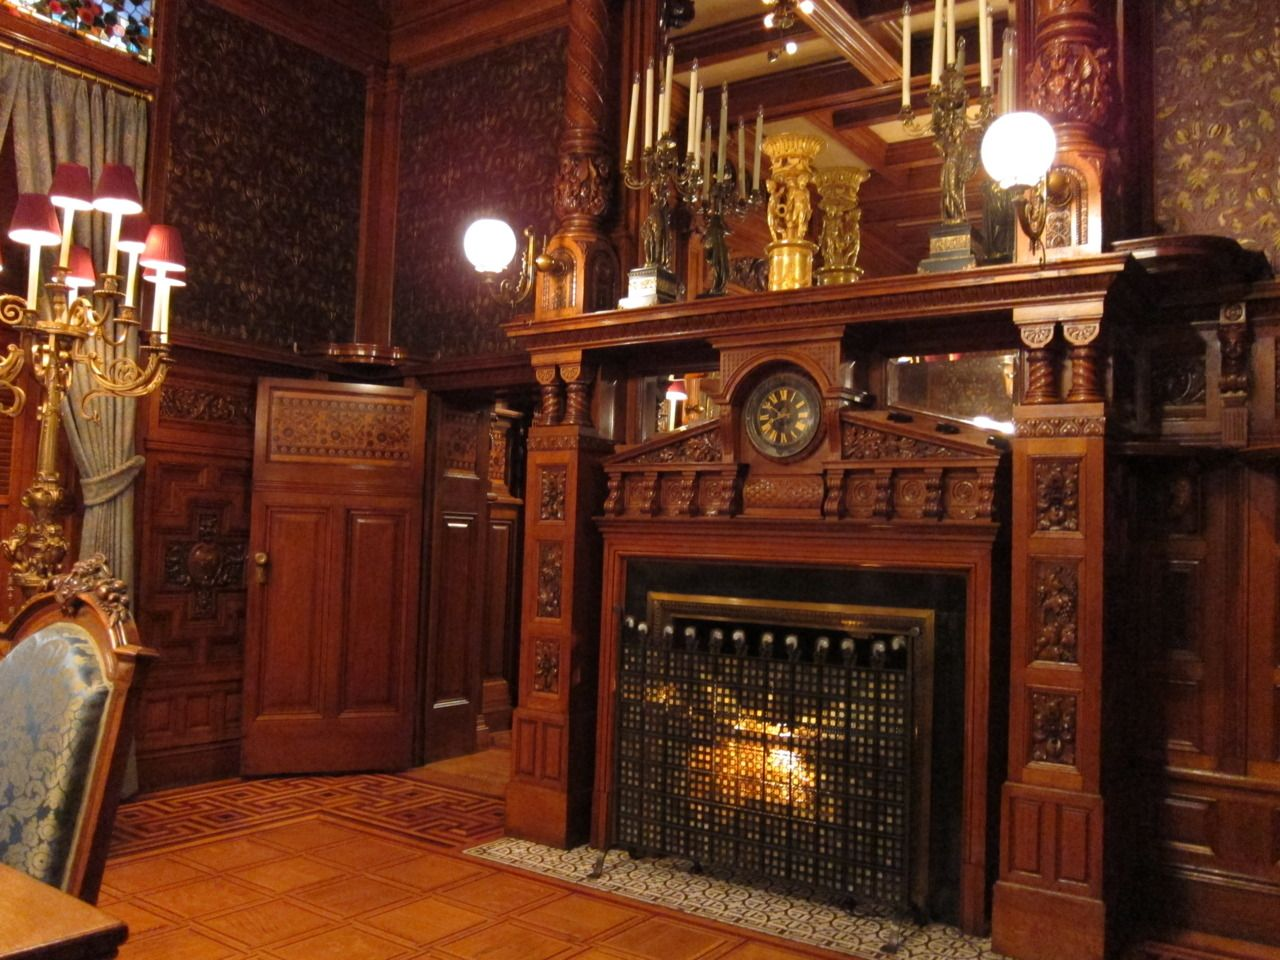 fireplace driehaus museum nickerson mansion chicago